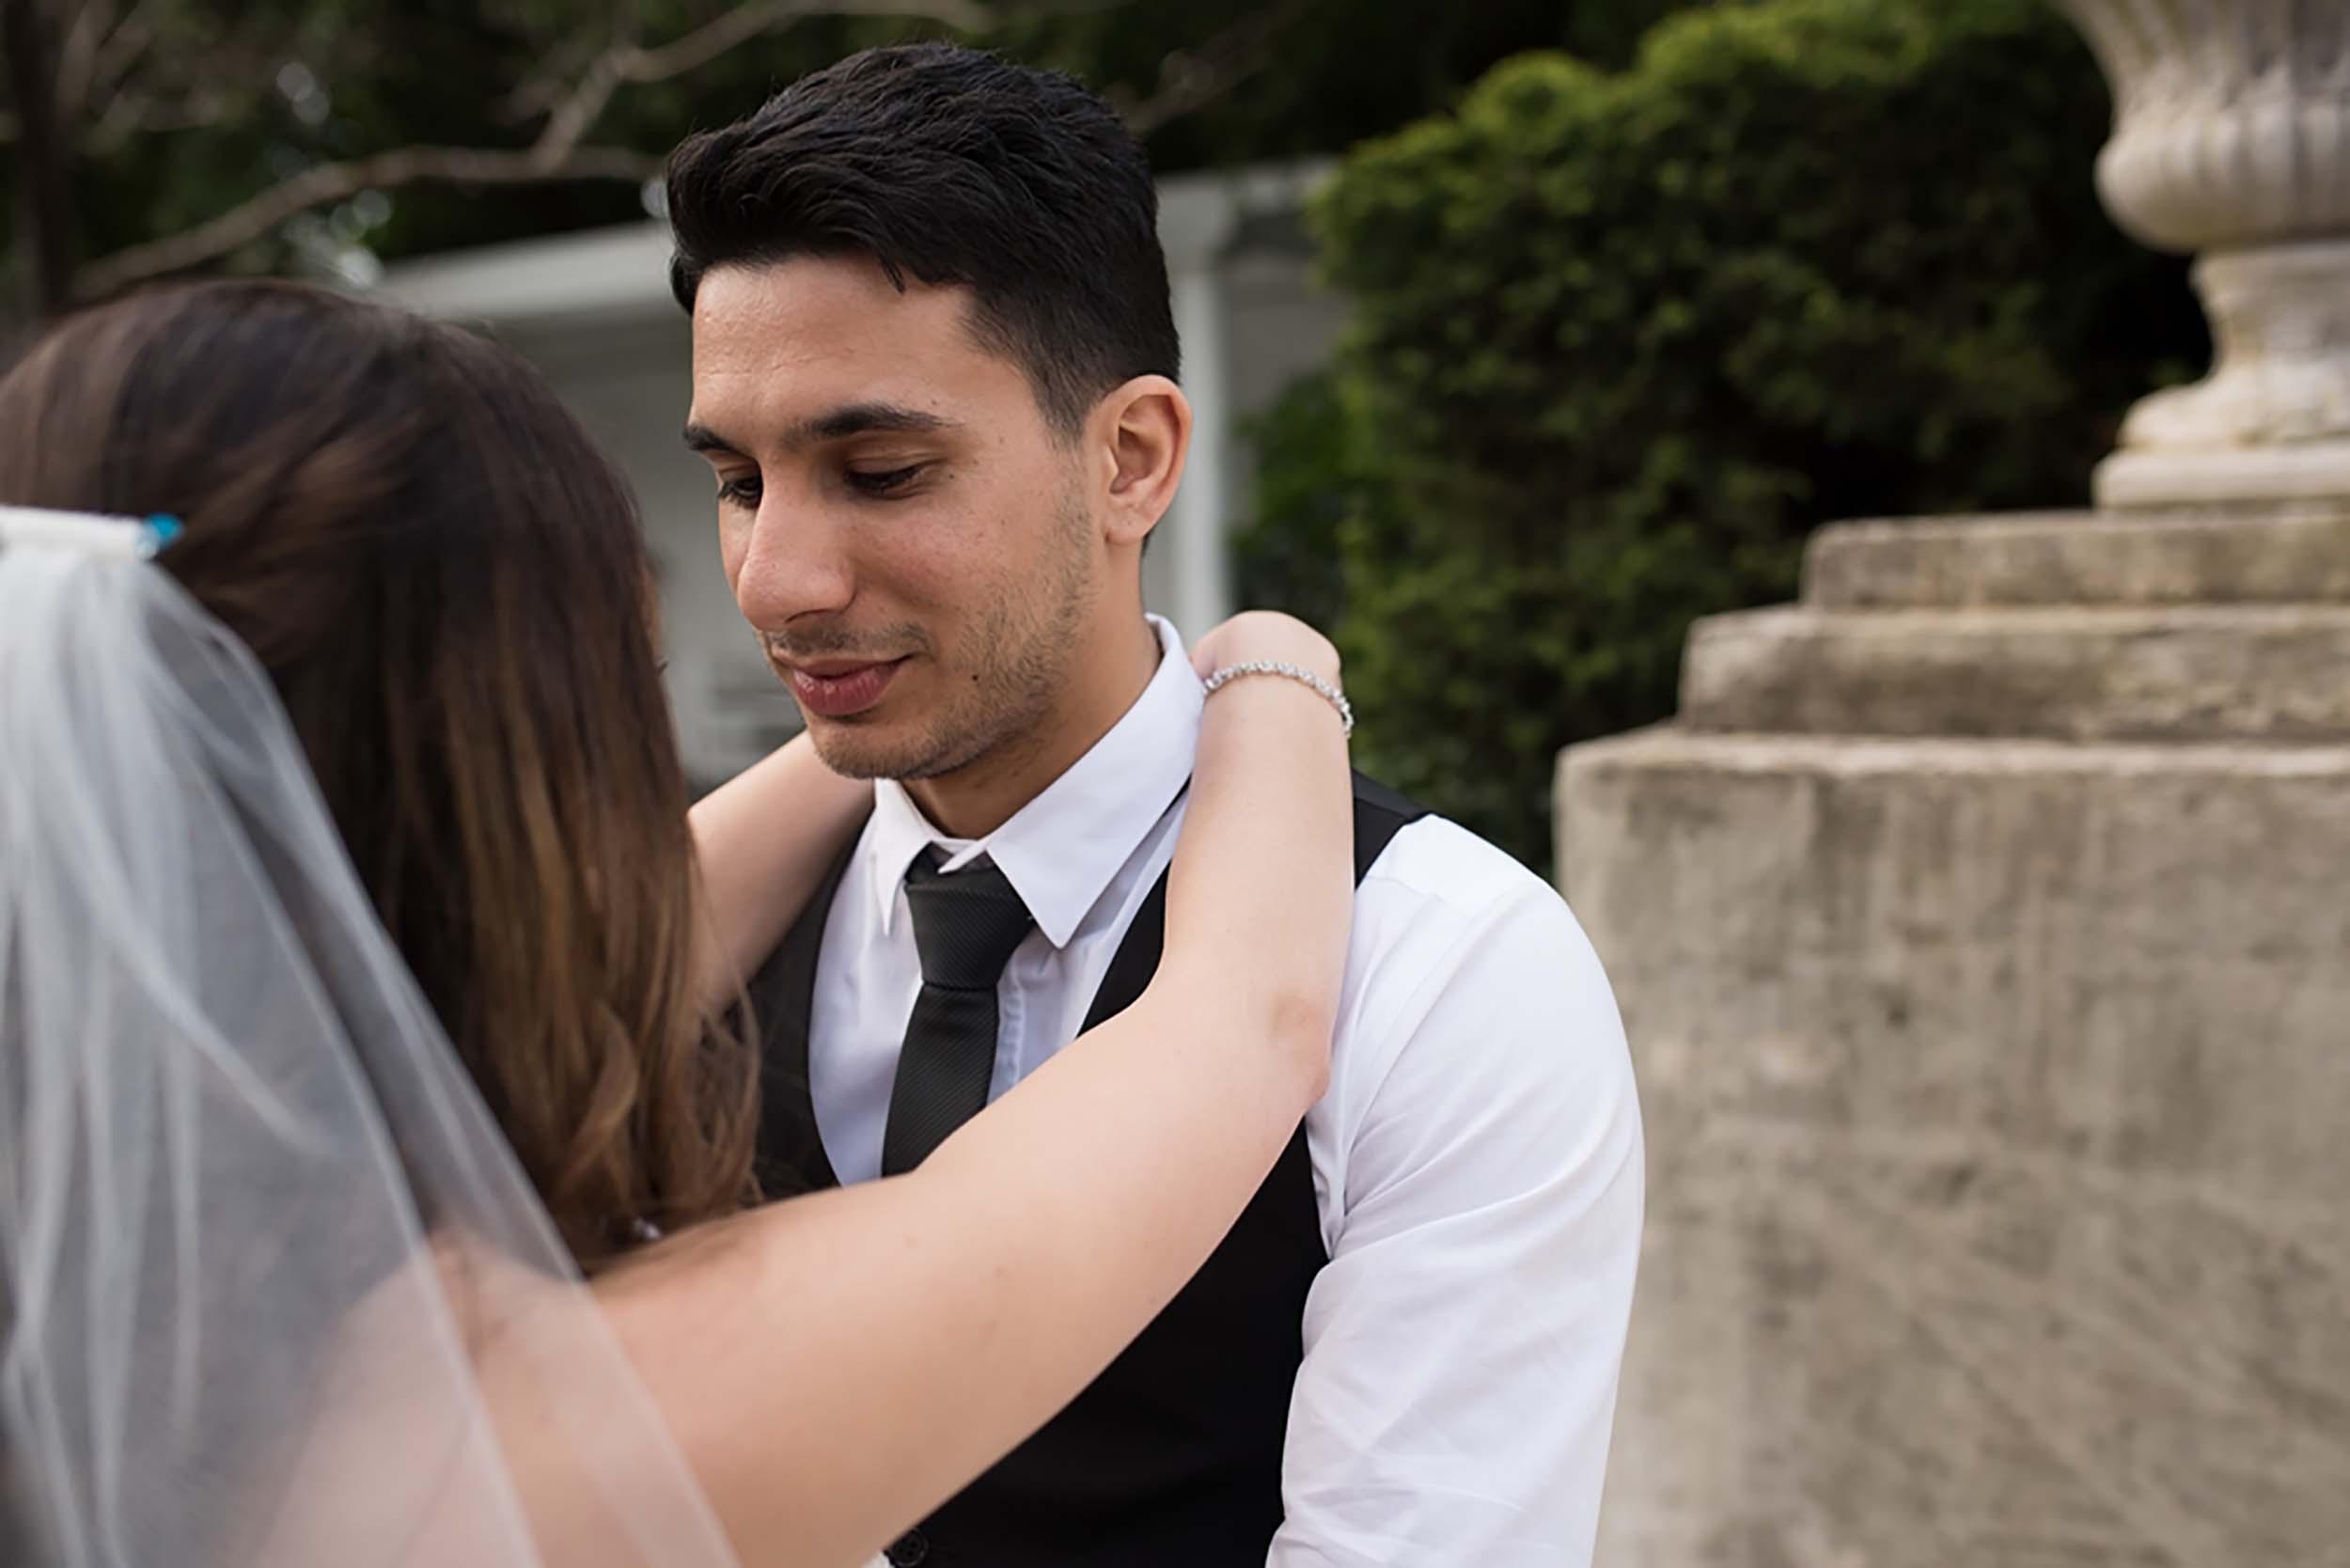 Bride and Groom | Australian Destination Wedding Planner